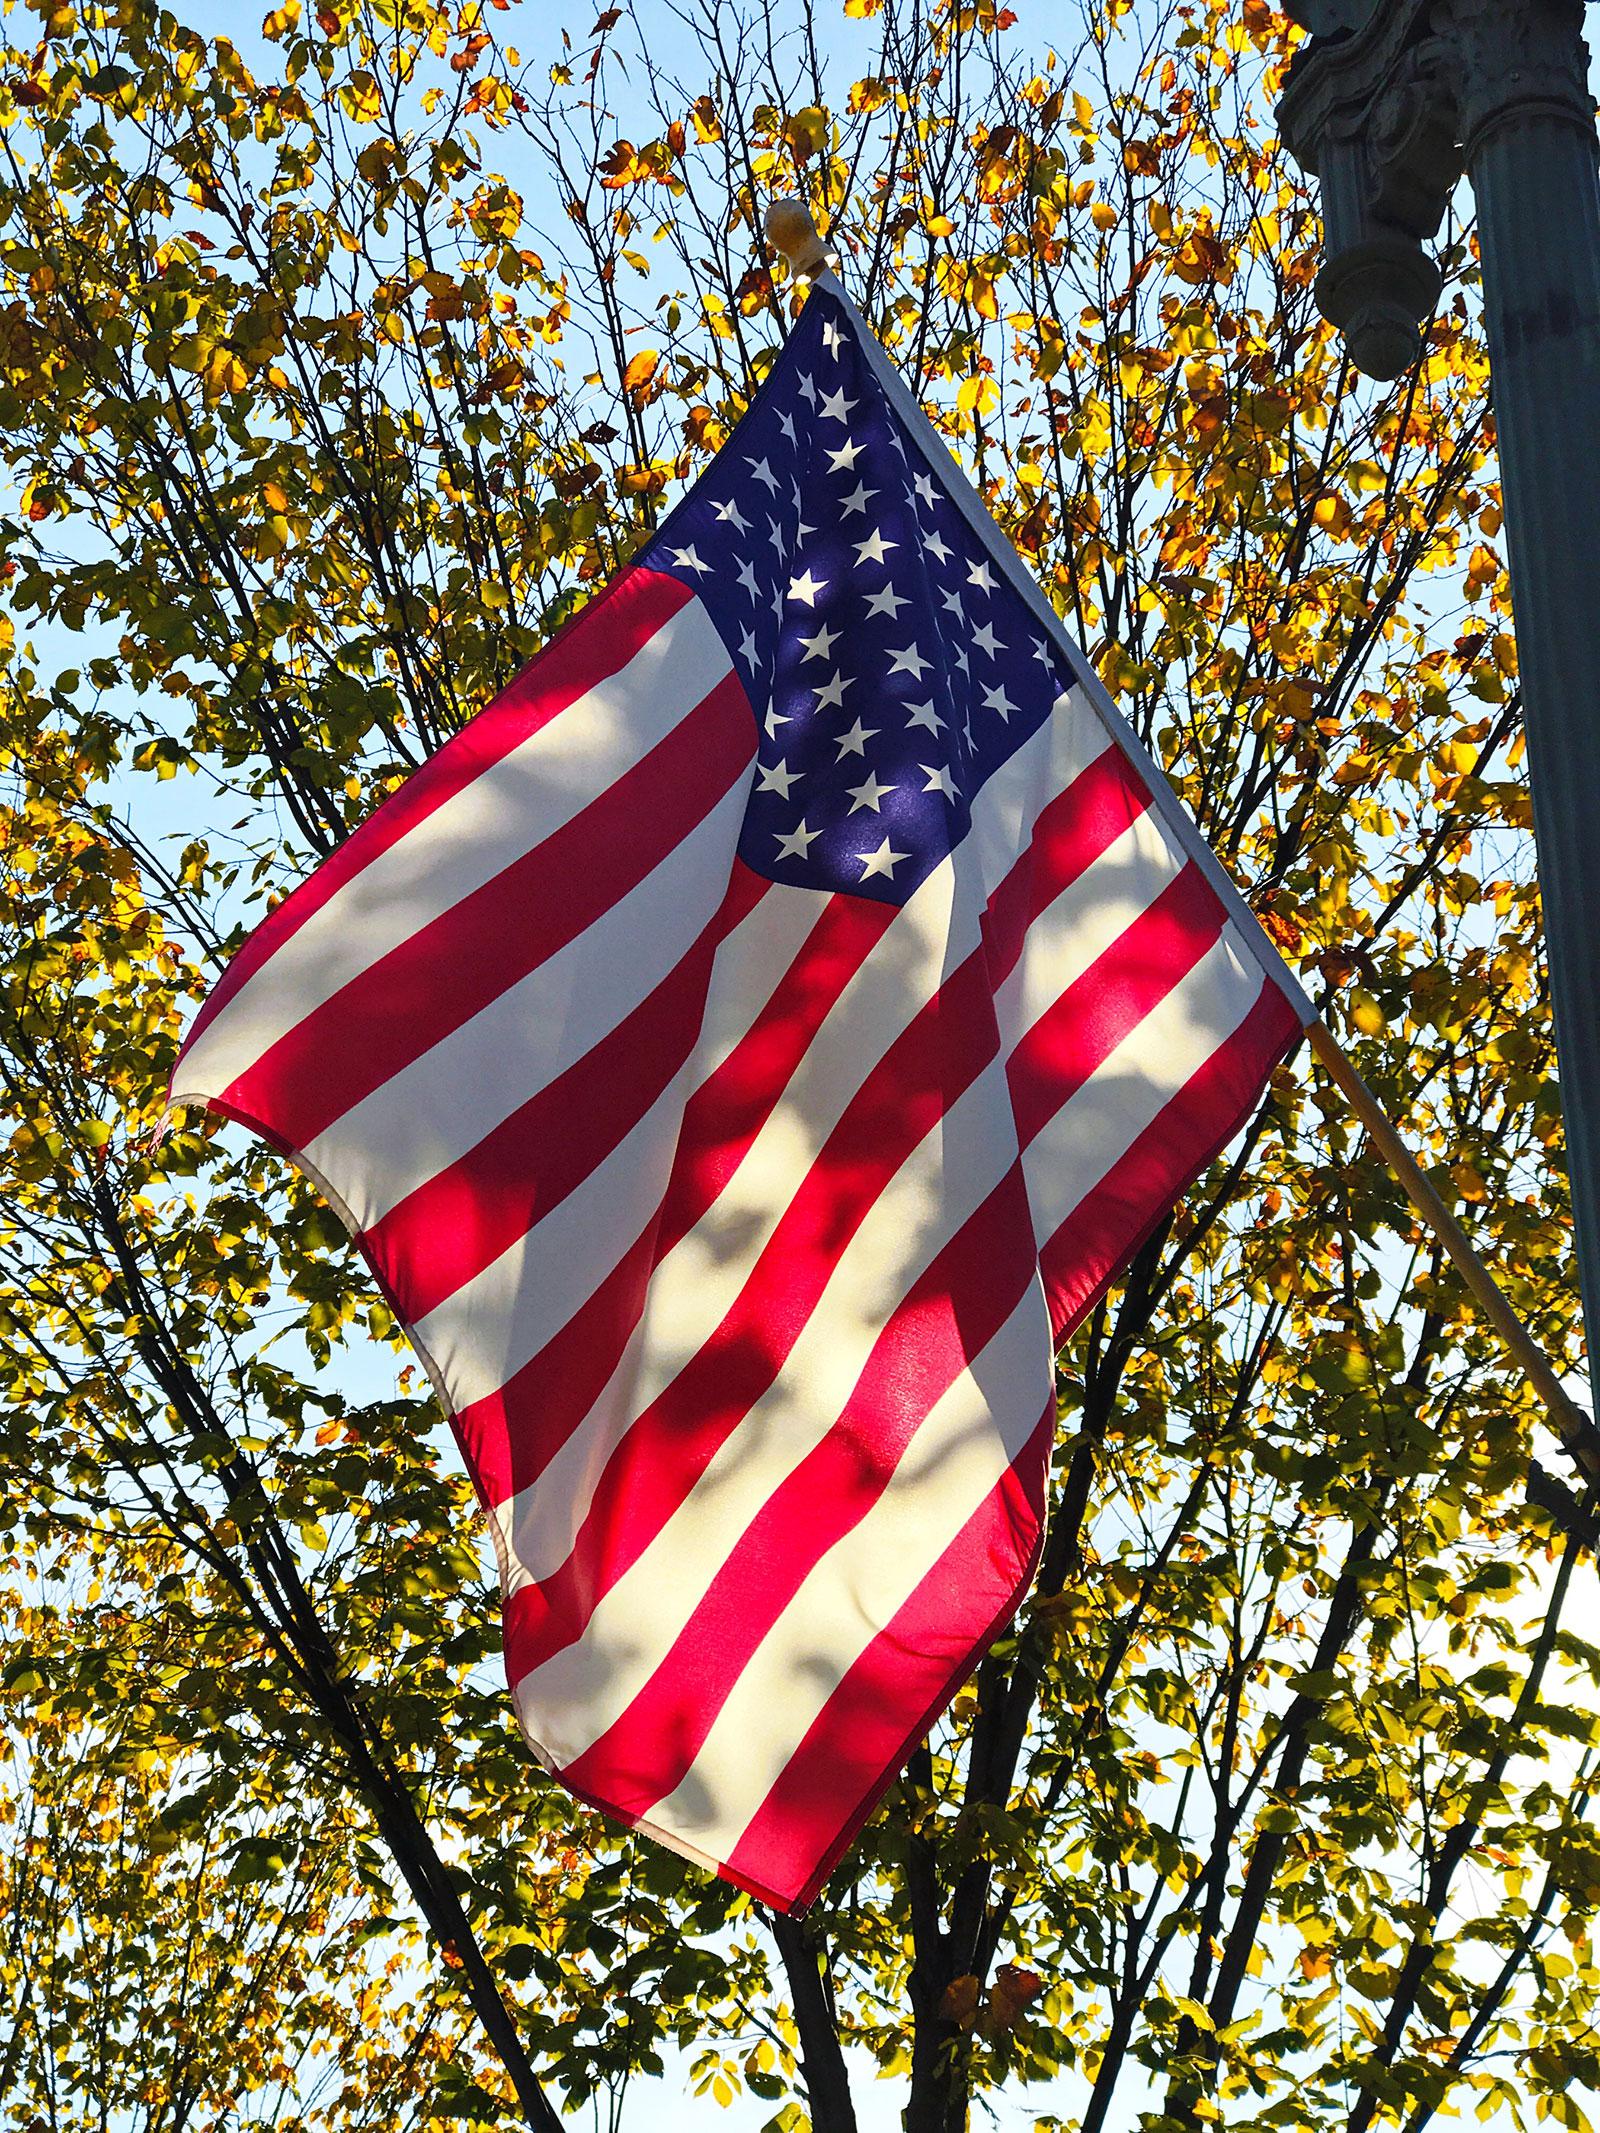 united states of america (photo taken by Julie Wampler, https://www.tablefortwoblog.com)